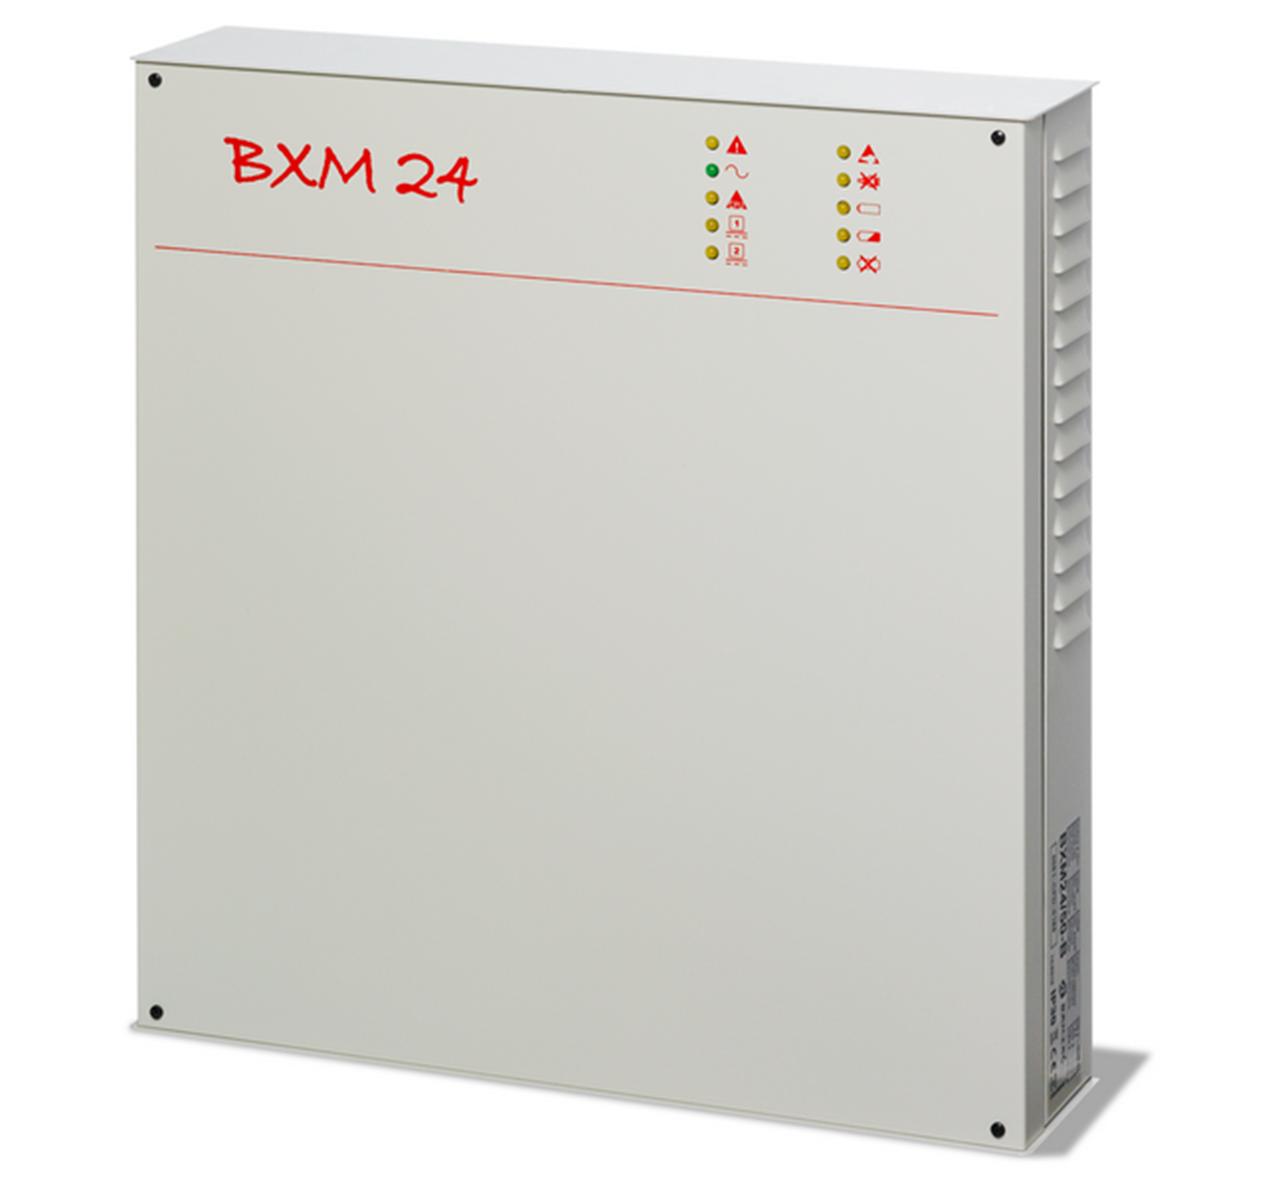 Bentel security BXM24/50-B - Microprocessor Controlled Power Station in Armenia at Vantag LLC